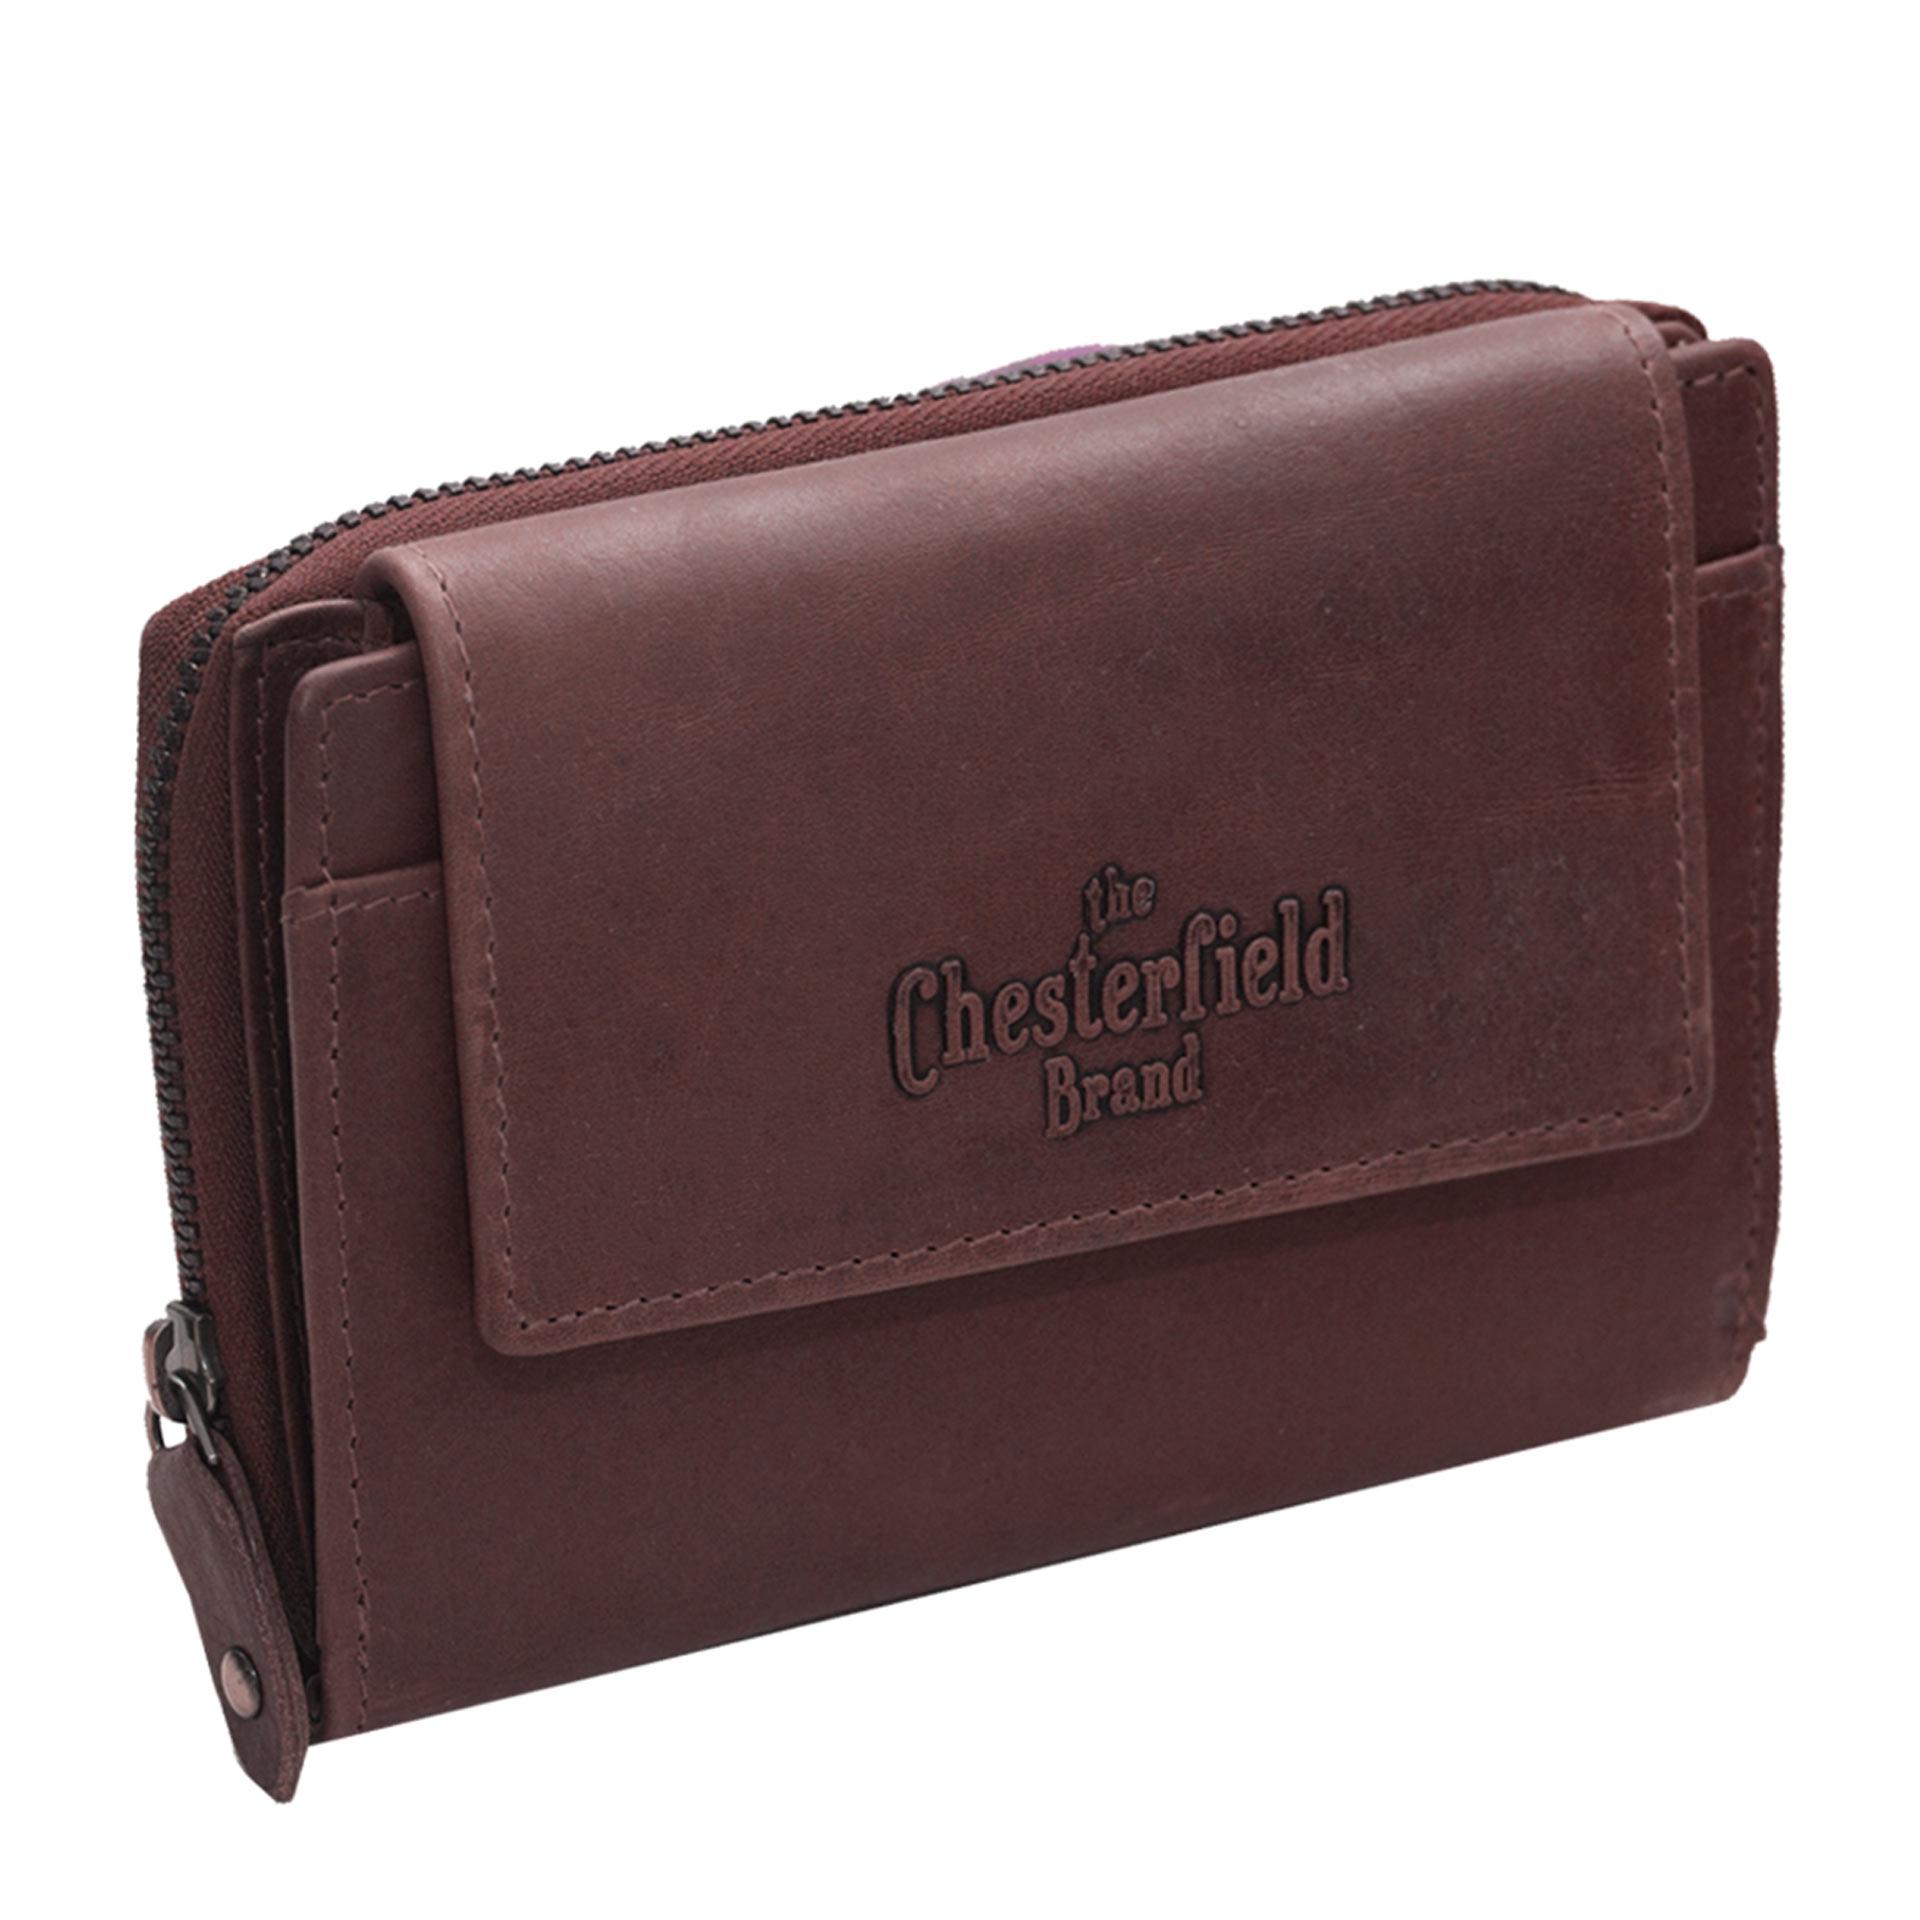 The Chesterfield Brand Ascot Geldbörse braun